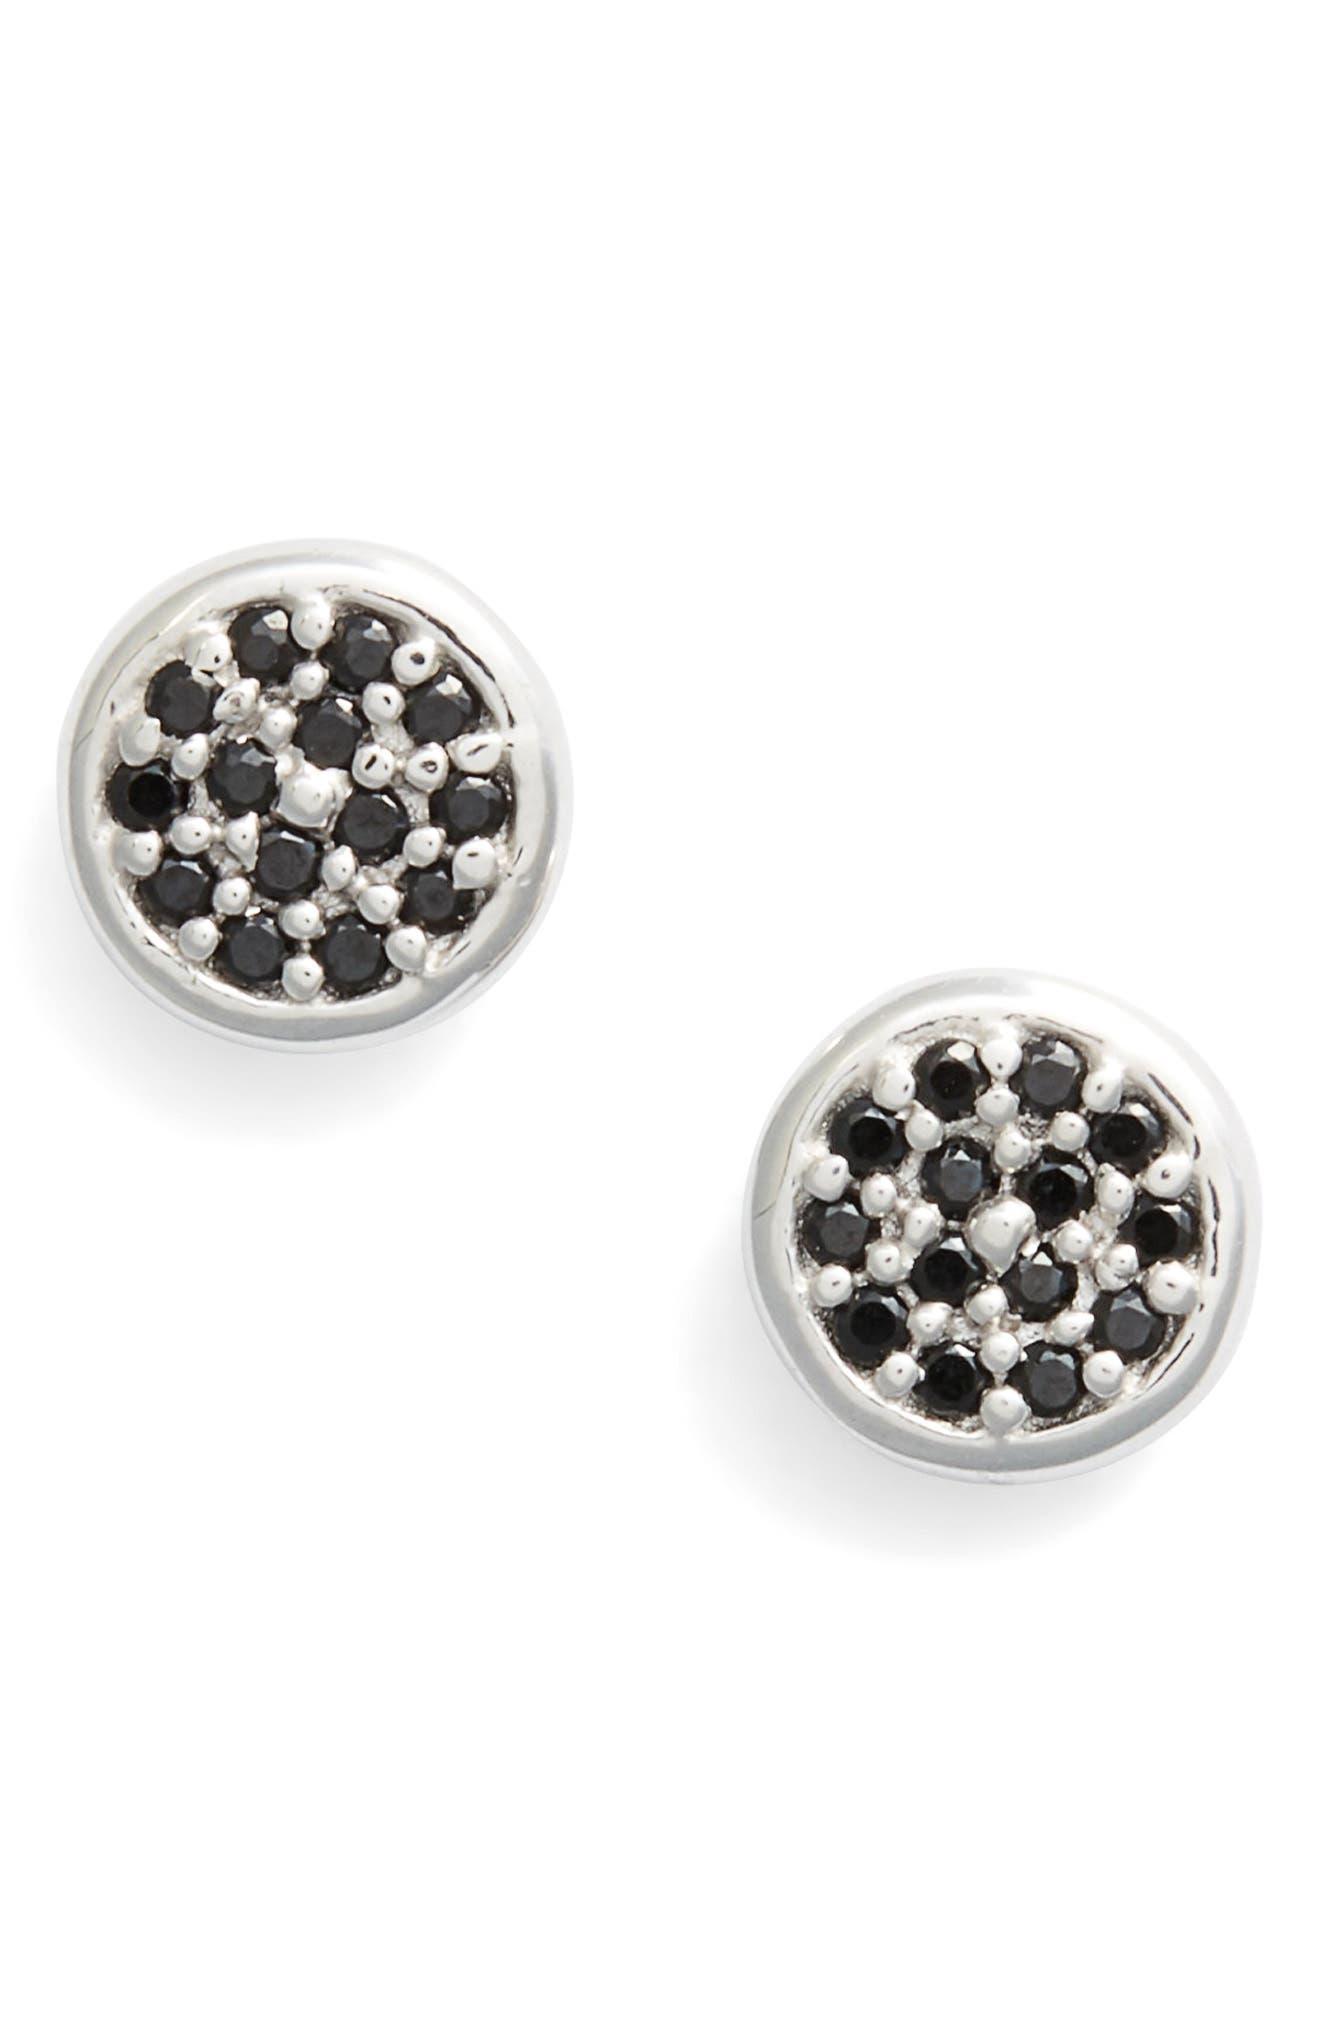 Cubic Zirconia Stud Earrings,                         Main,                         color, BLACK/ SILVER